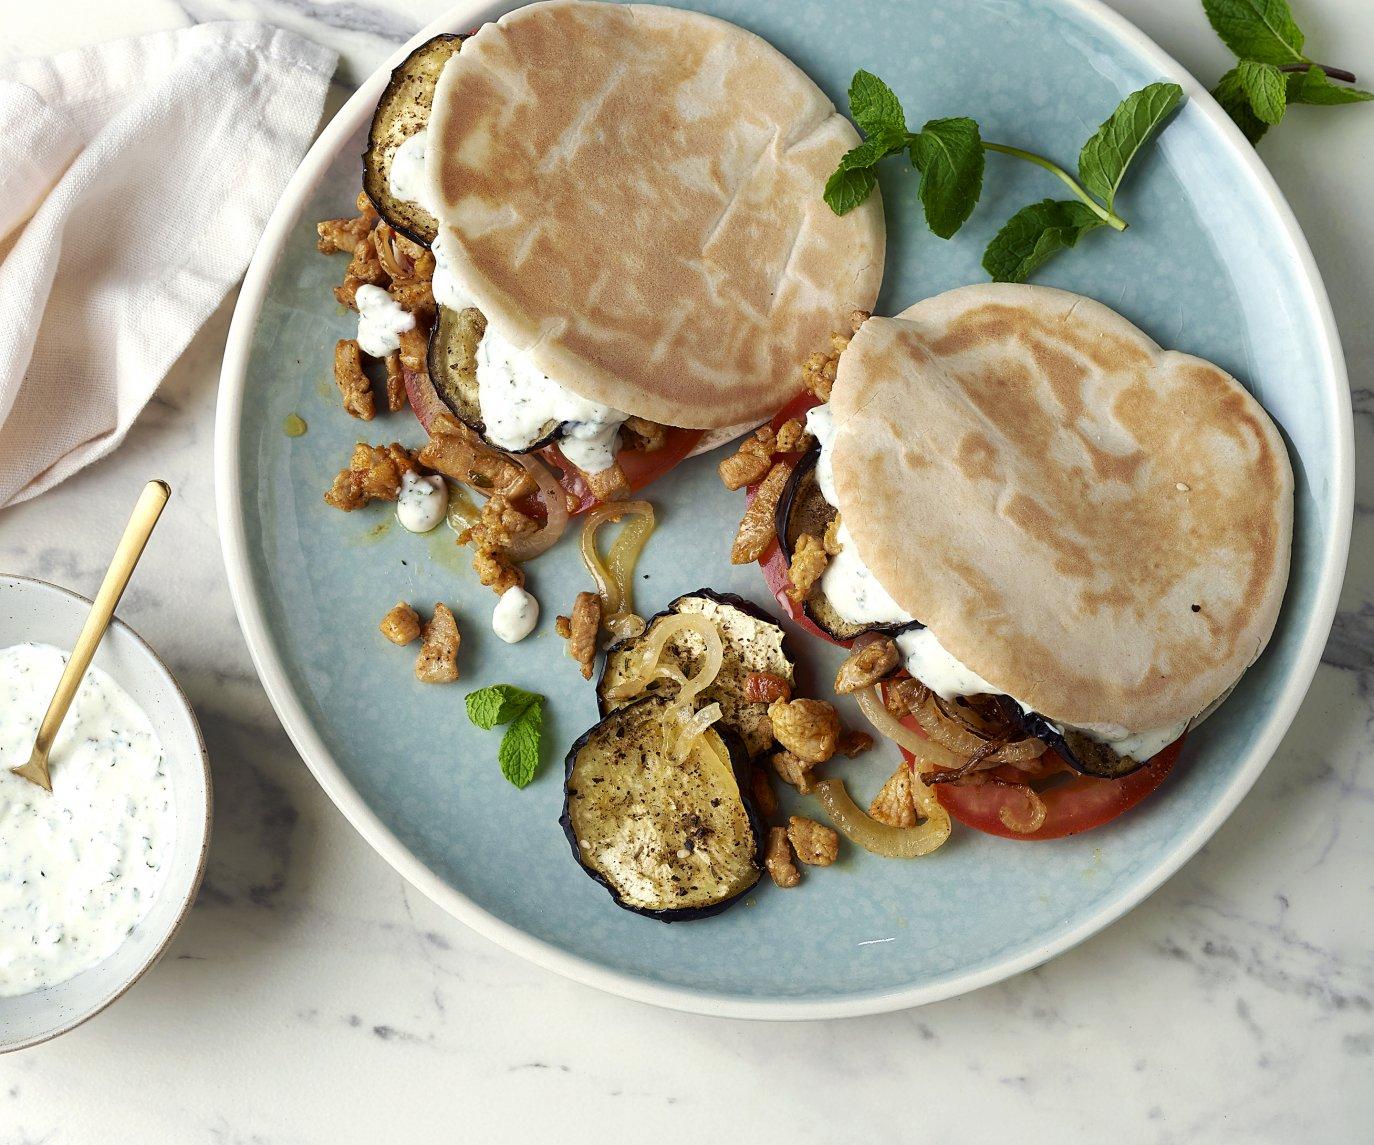 Pita's met kalkoenshoarma, geroosterde aubergine en yoghurt-muntsaus